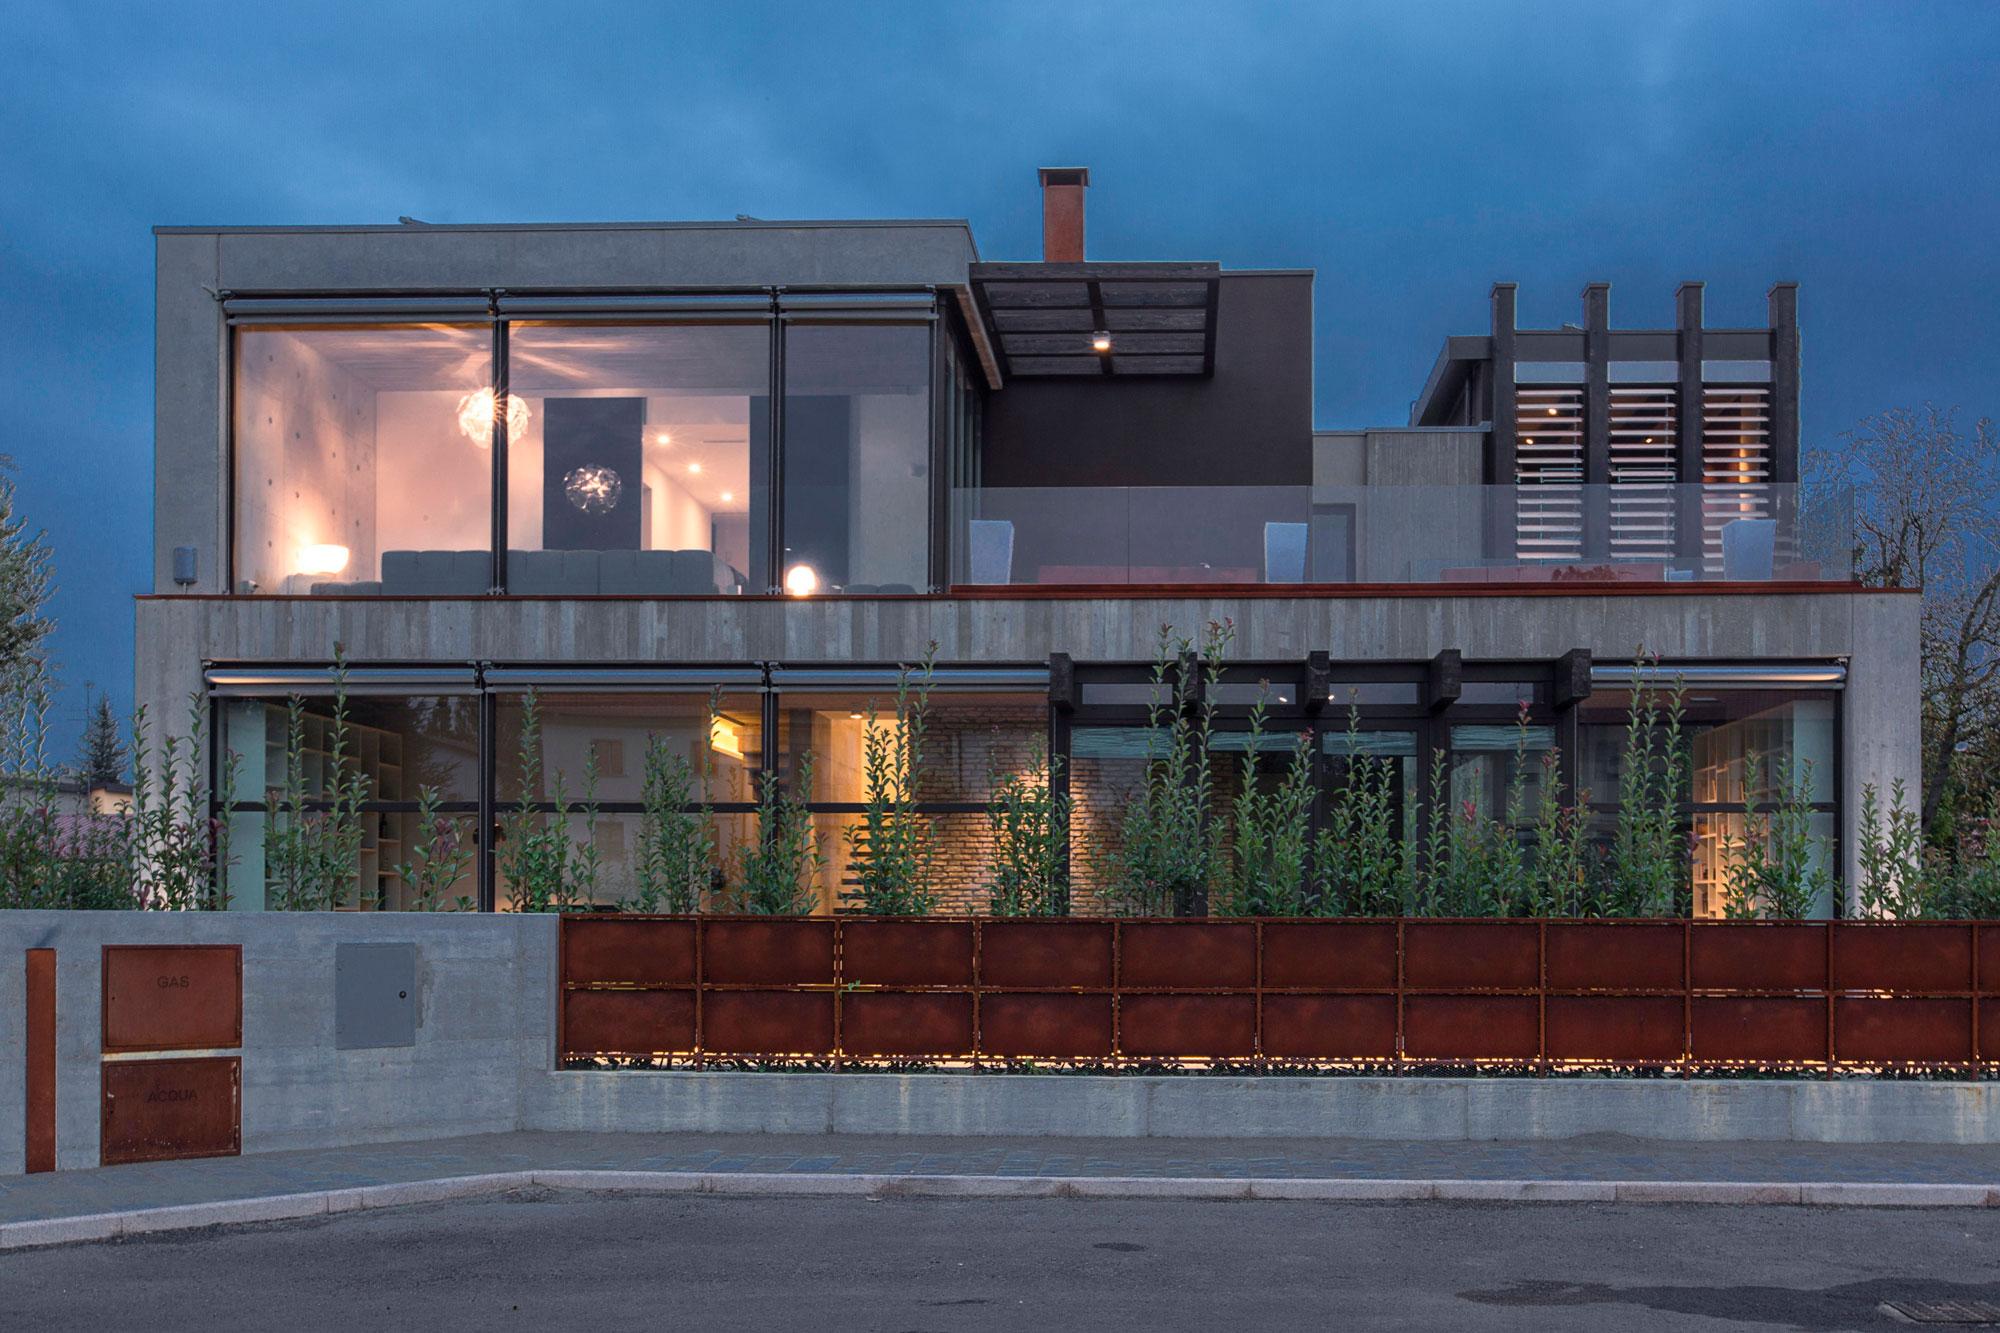 D'Autore Residence near Bologna by Giraldi Associati Architetti-50